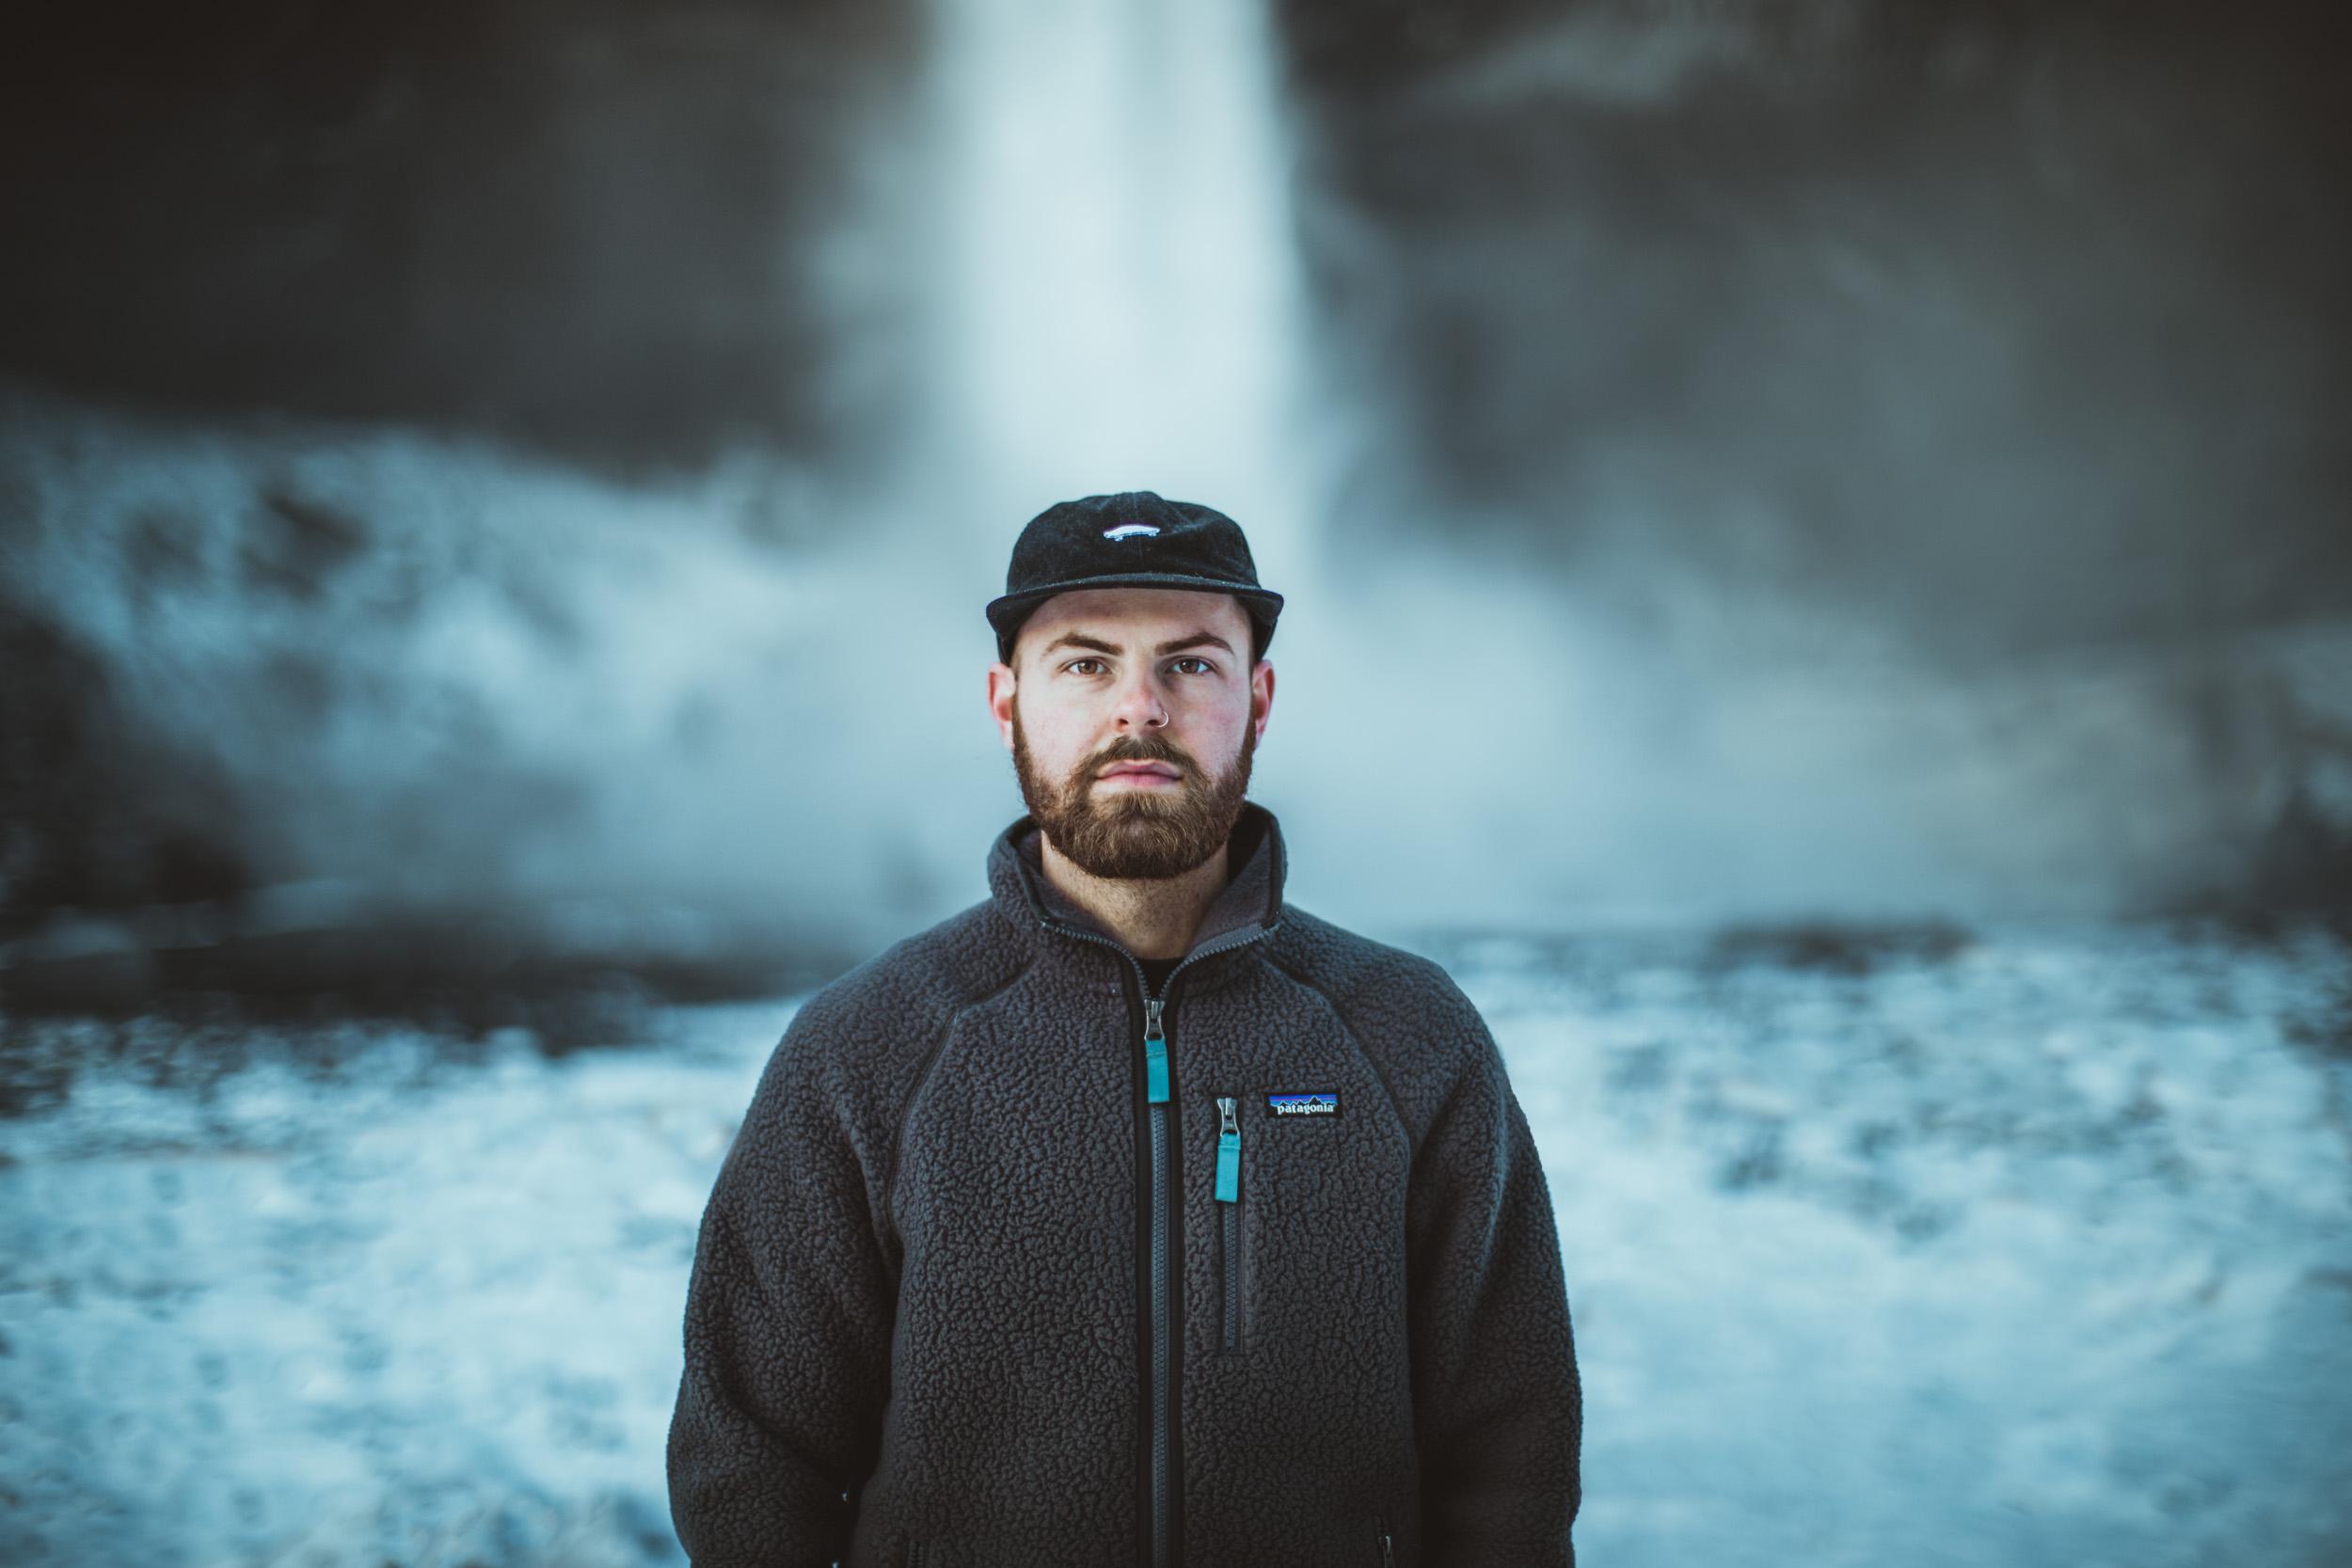 Iceland_Jan_2019_ByTomKahler_Lowres (241 of 262).jpg